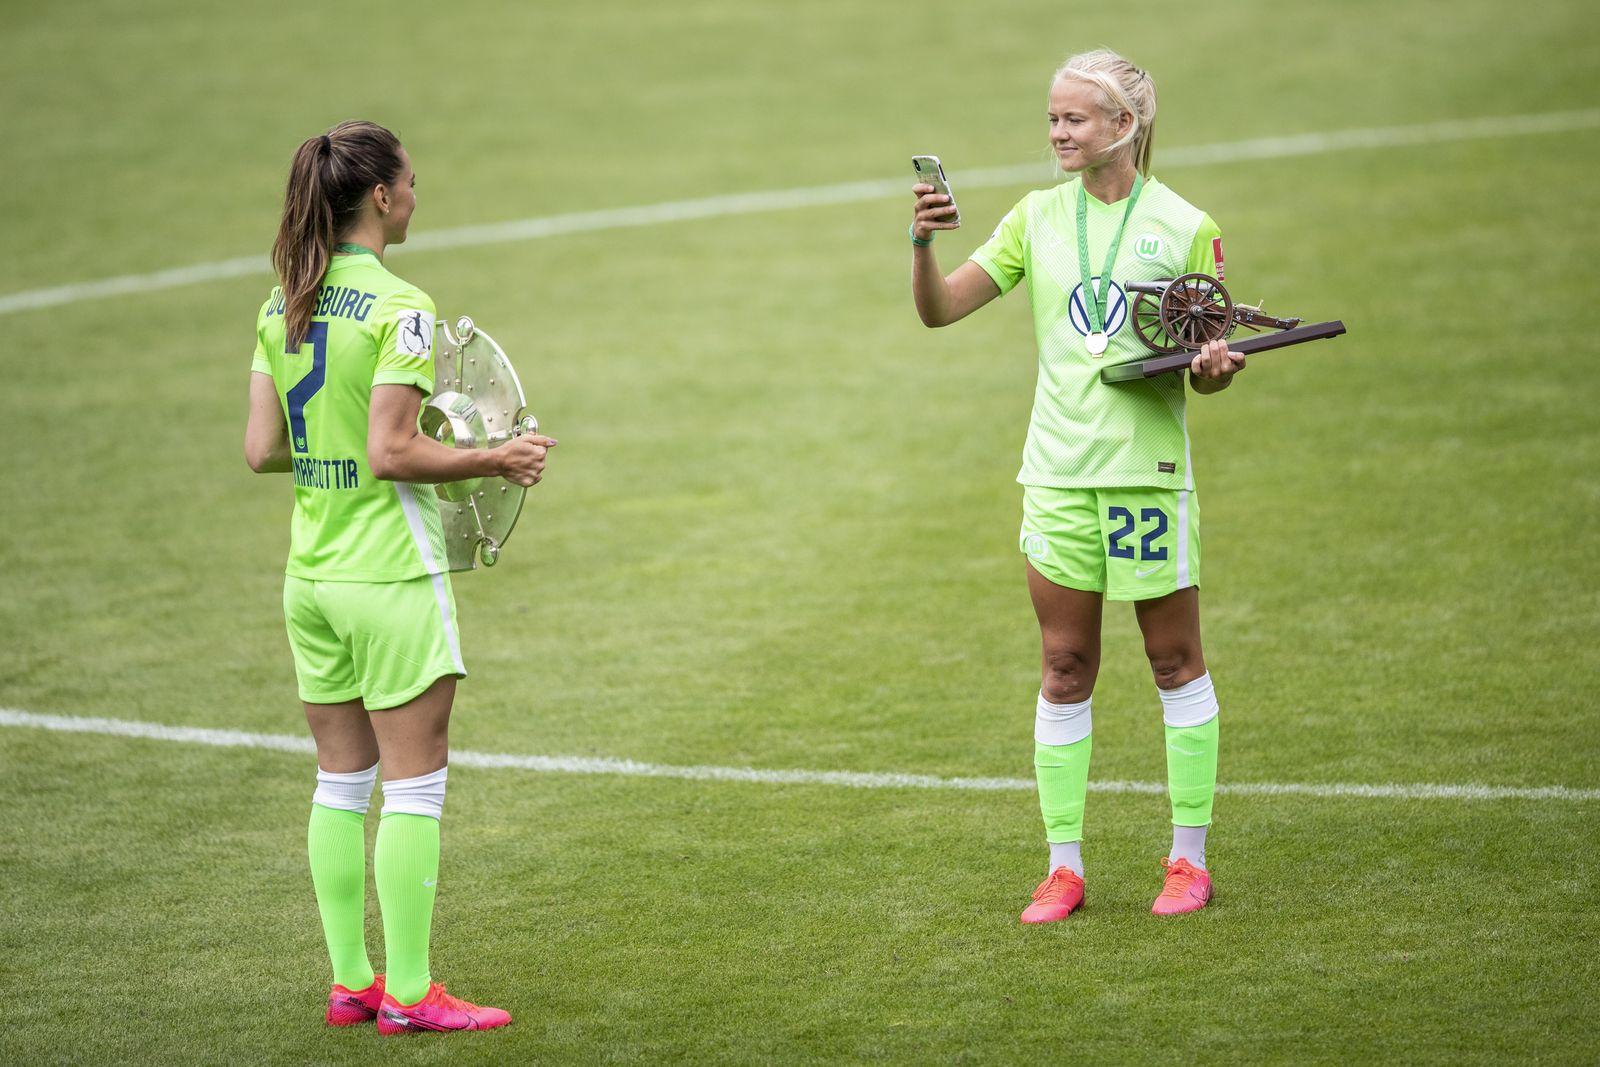 VfL Wolfsburg Women's v Bayer 04 Leverkusen Women's - Flyeralarm Frauen-Bundesliga